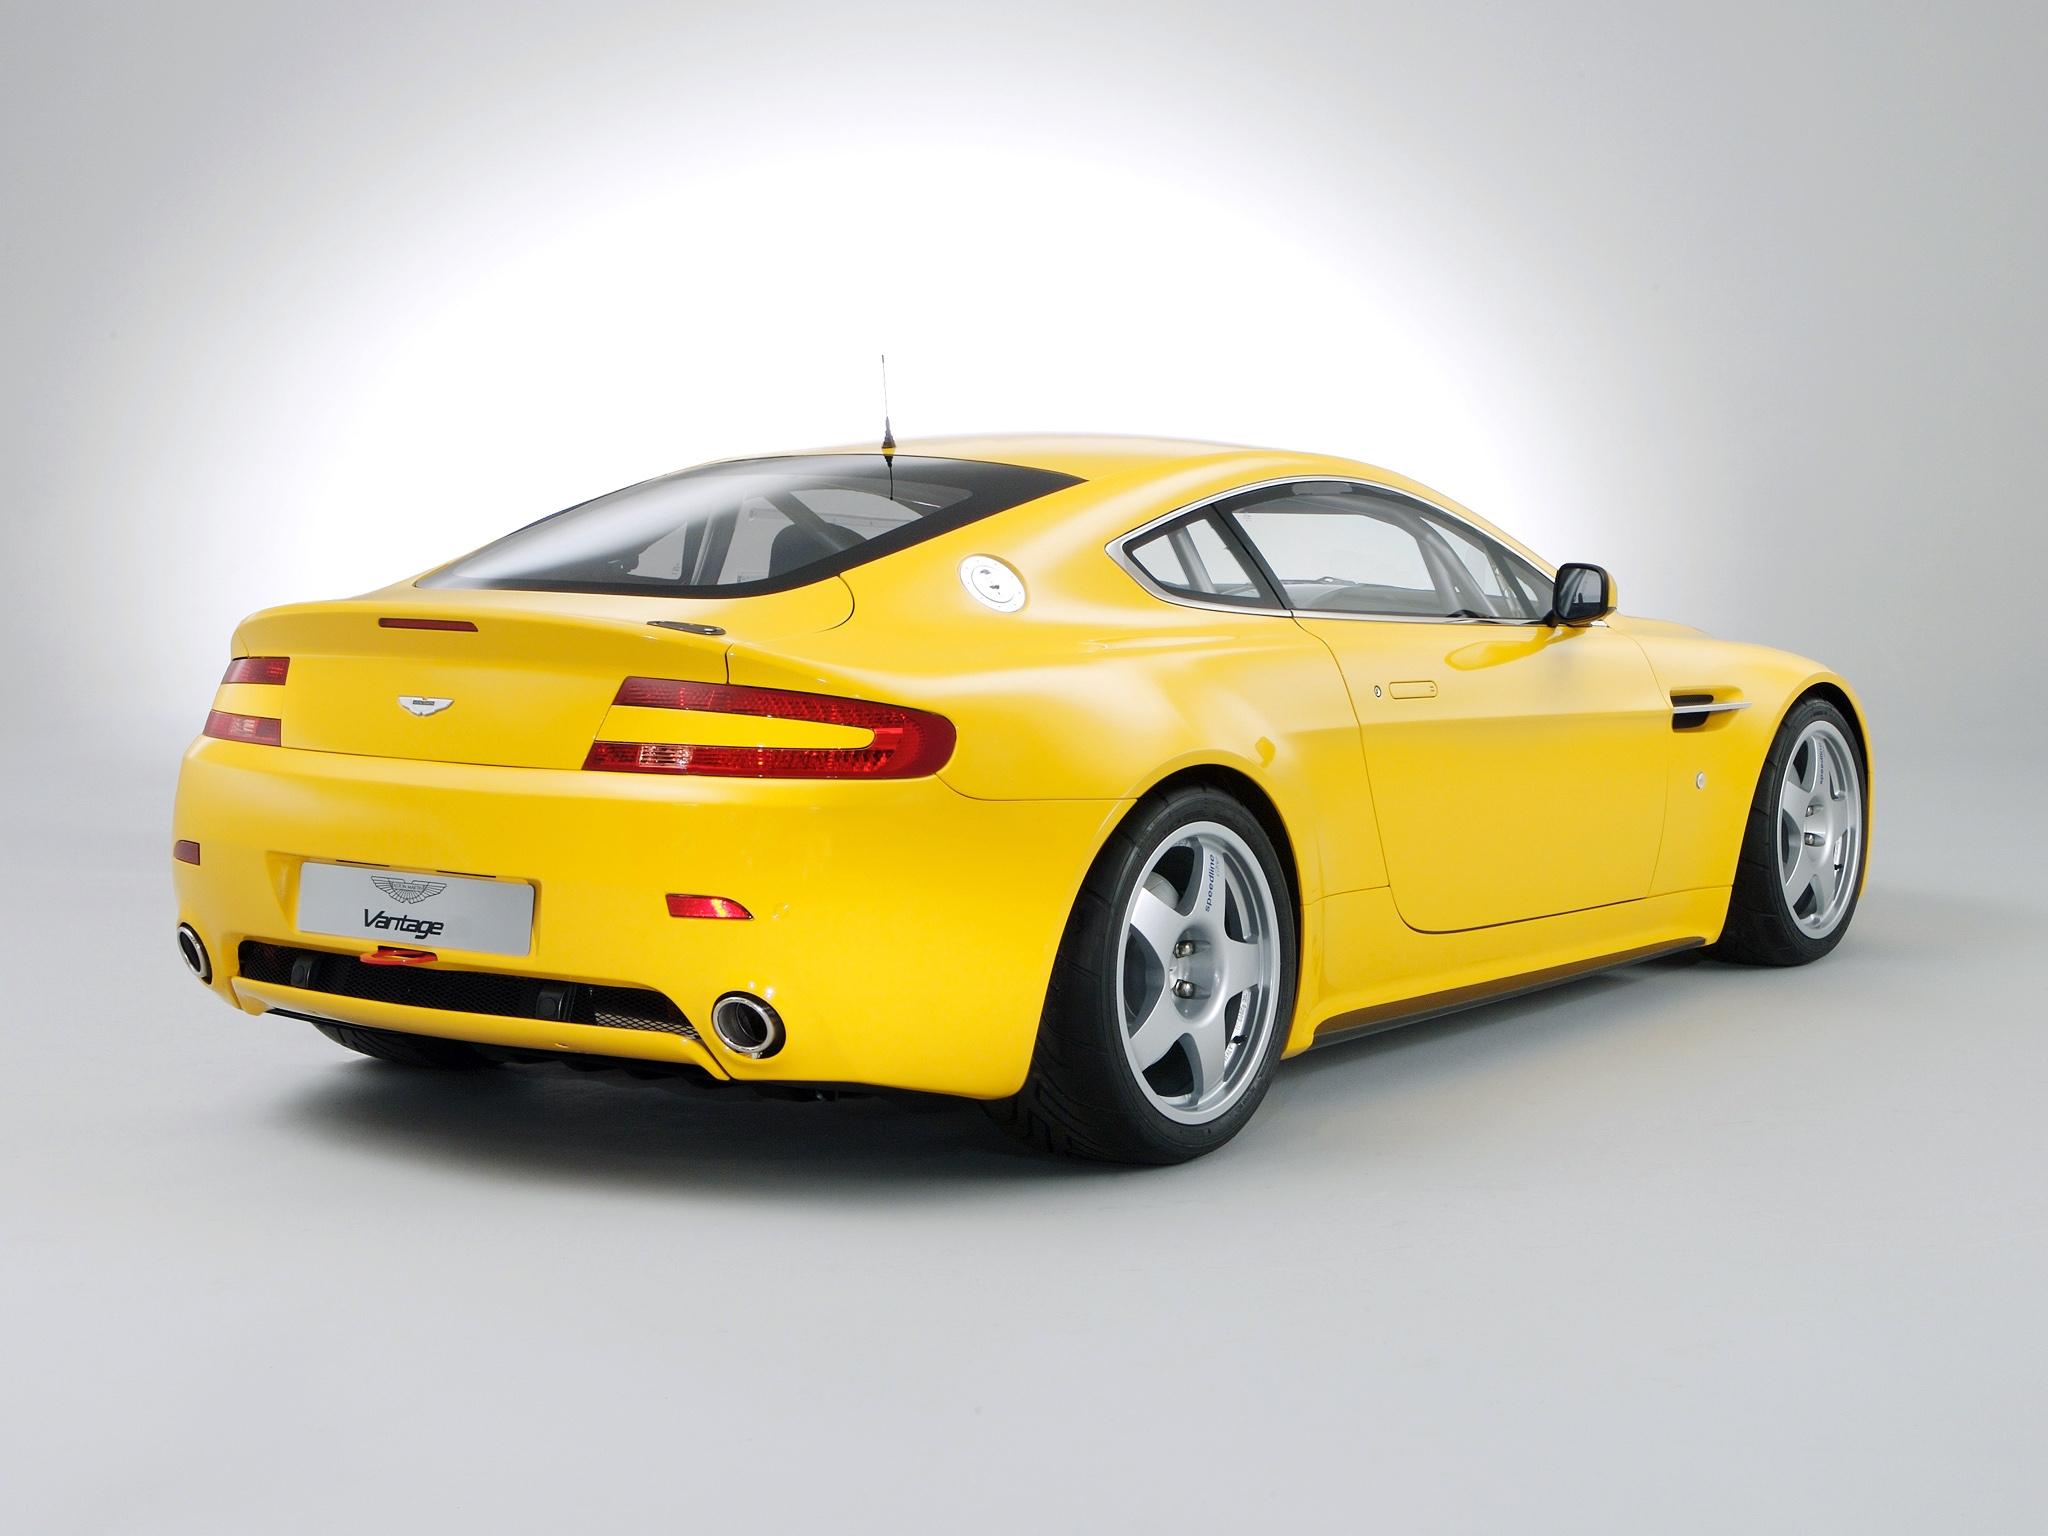 Wallpaper Aston Martin V8 Vantage 2007 Yellow Rear View Style 2048x1536 Goodfon 1078390 Hd Wallpapers Wallhere